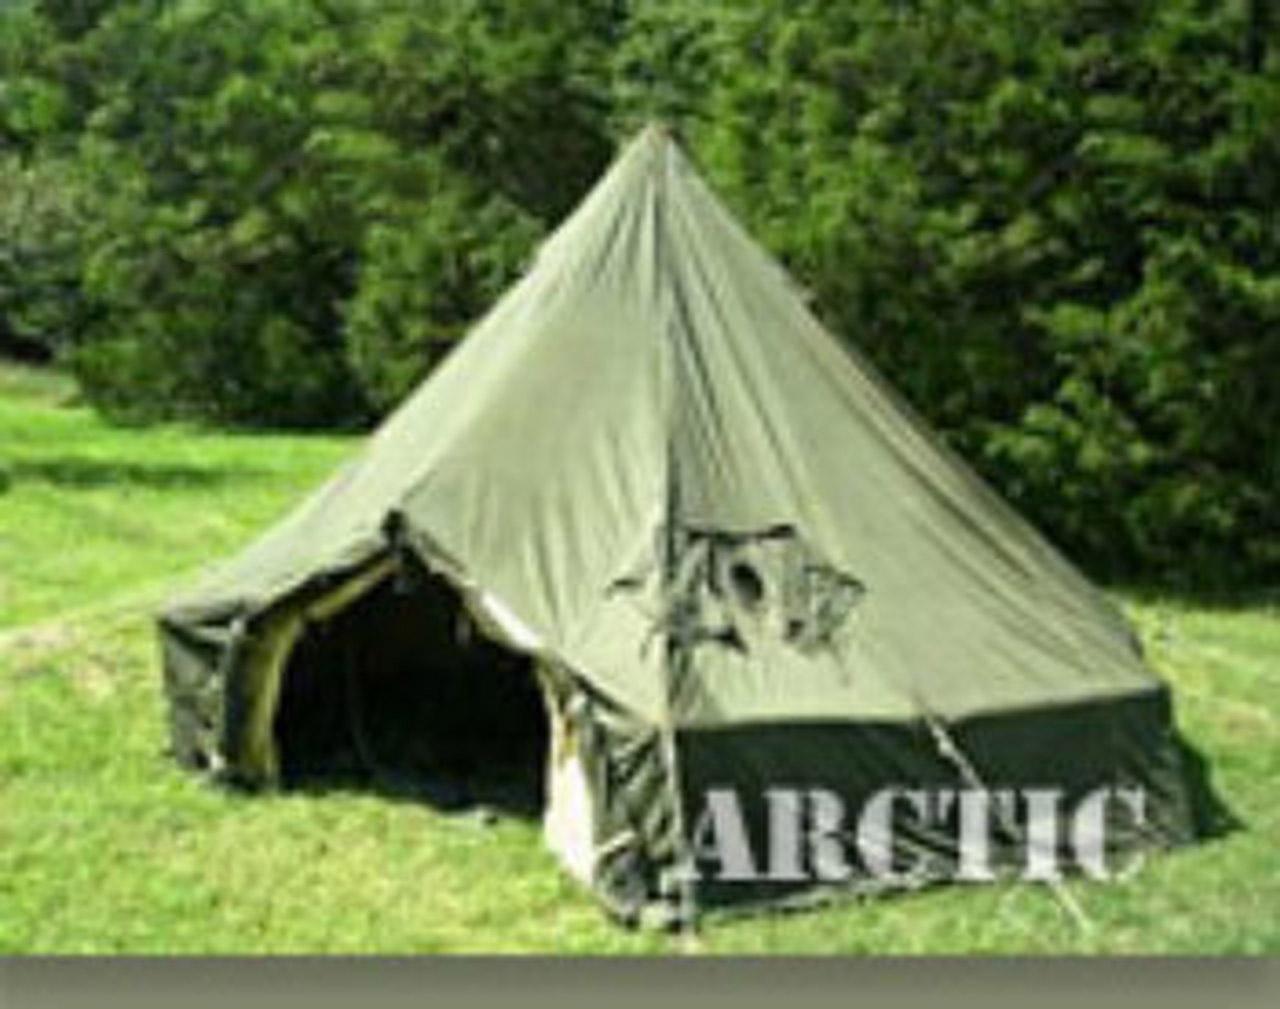 10 Man U.S. Arctic Bell Tent w/ Liner - Like NEW